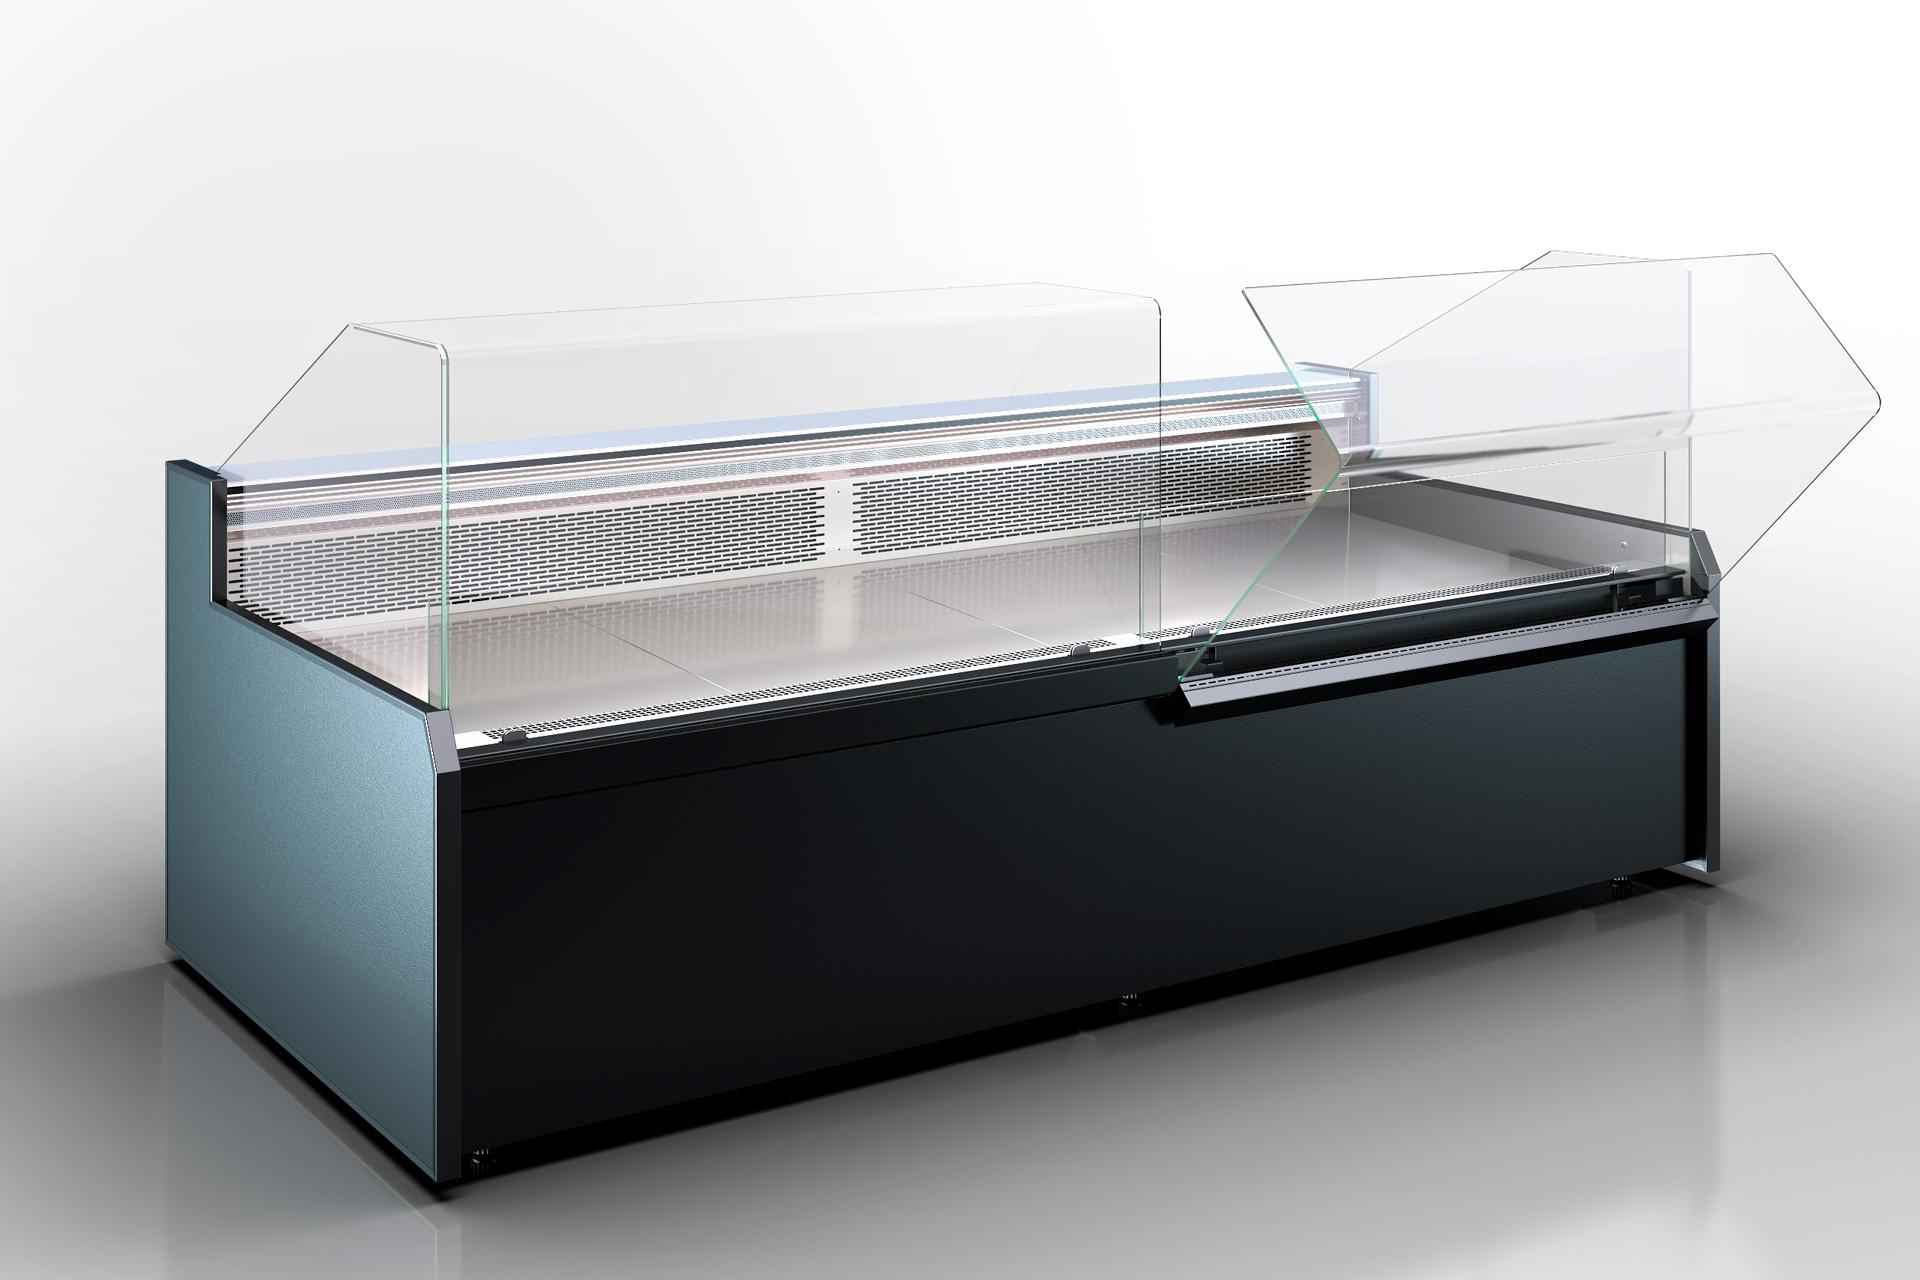 Refrigerating counters Missouri MC 120 deli OS 120-DBM/DLM